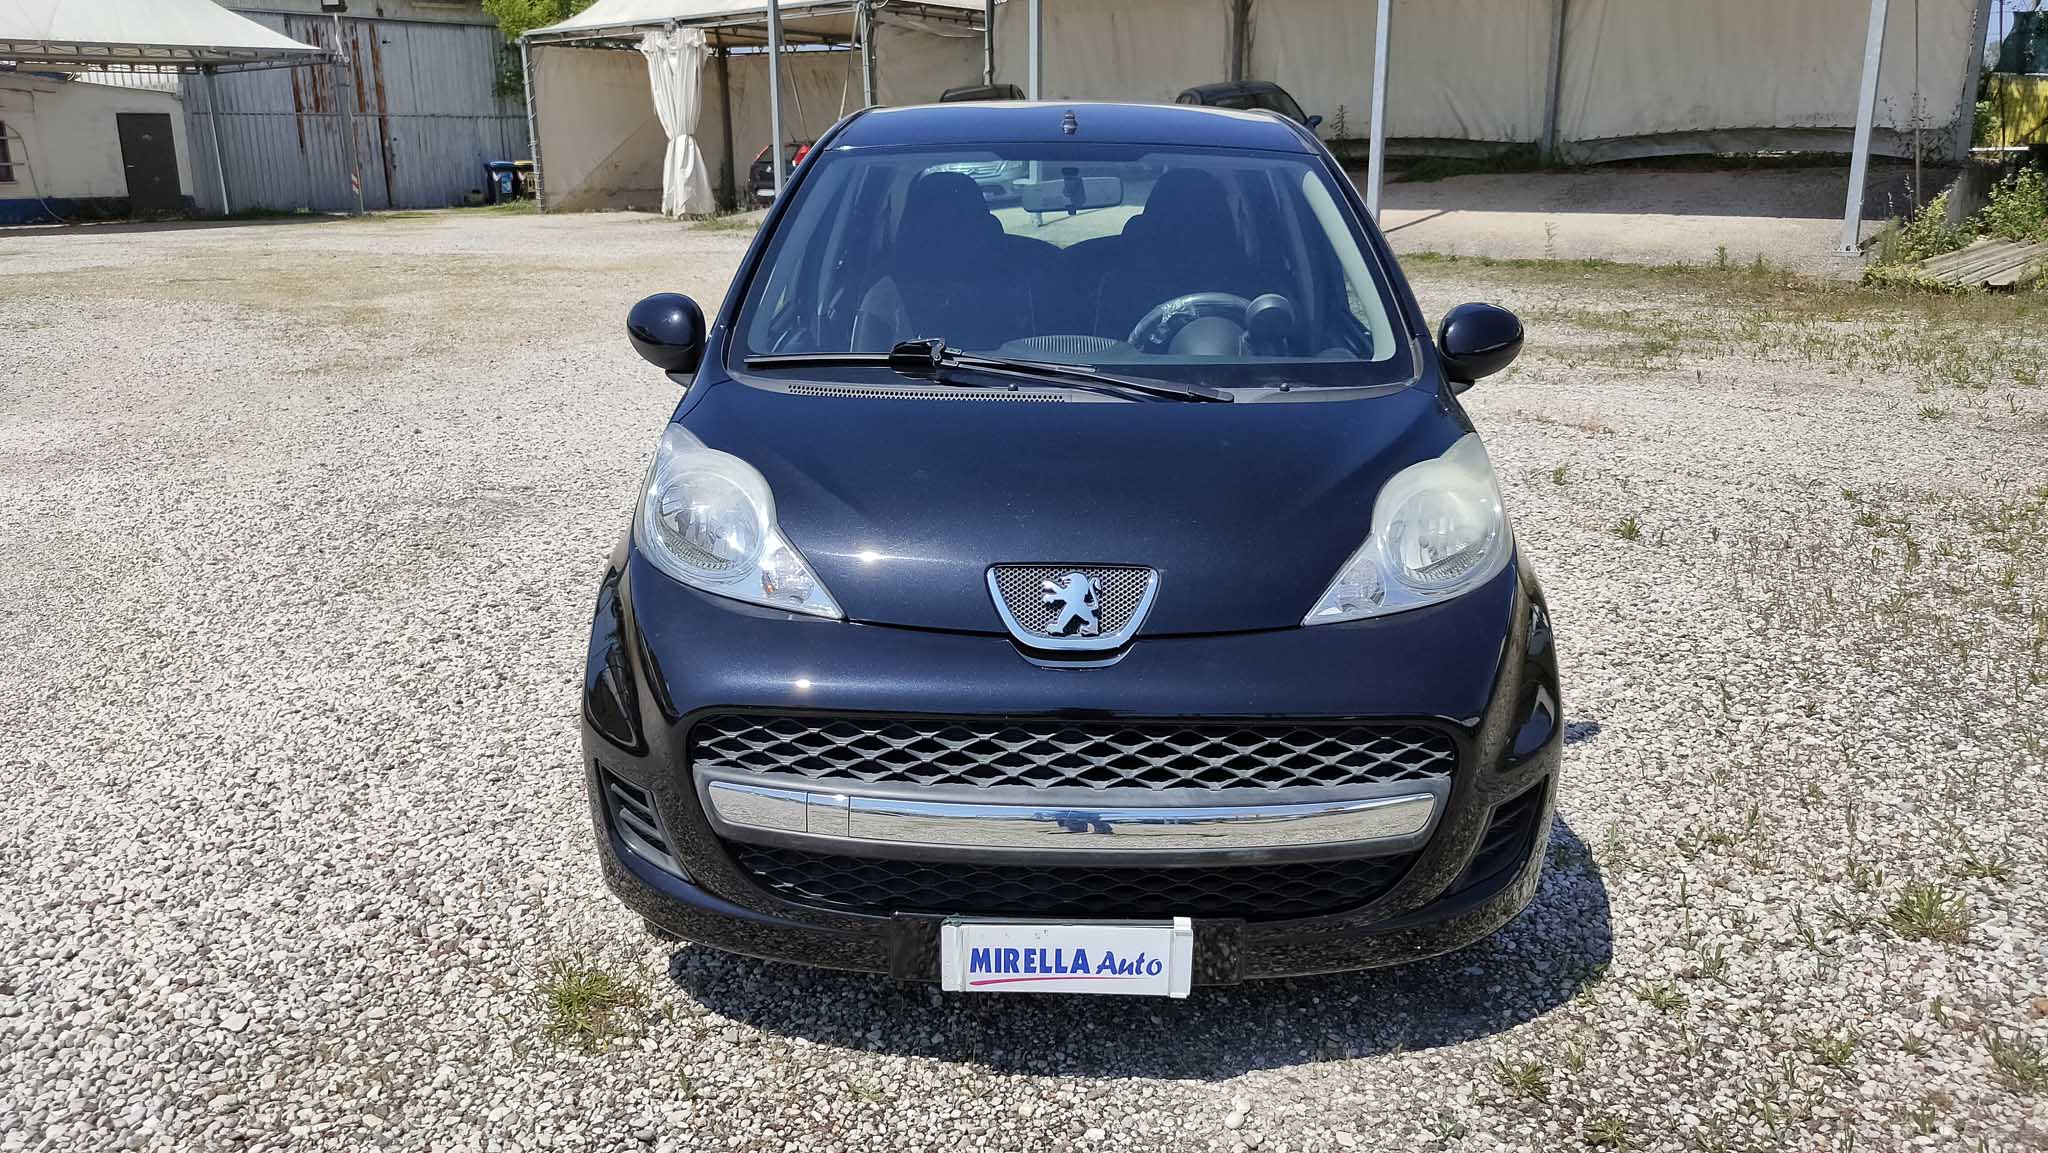 107-nera-mirella-auto-4